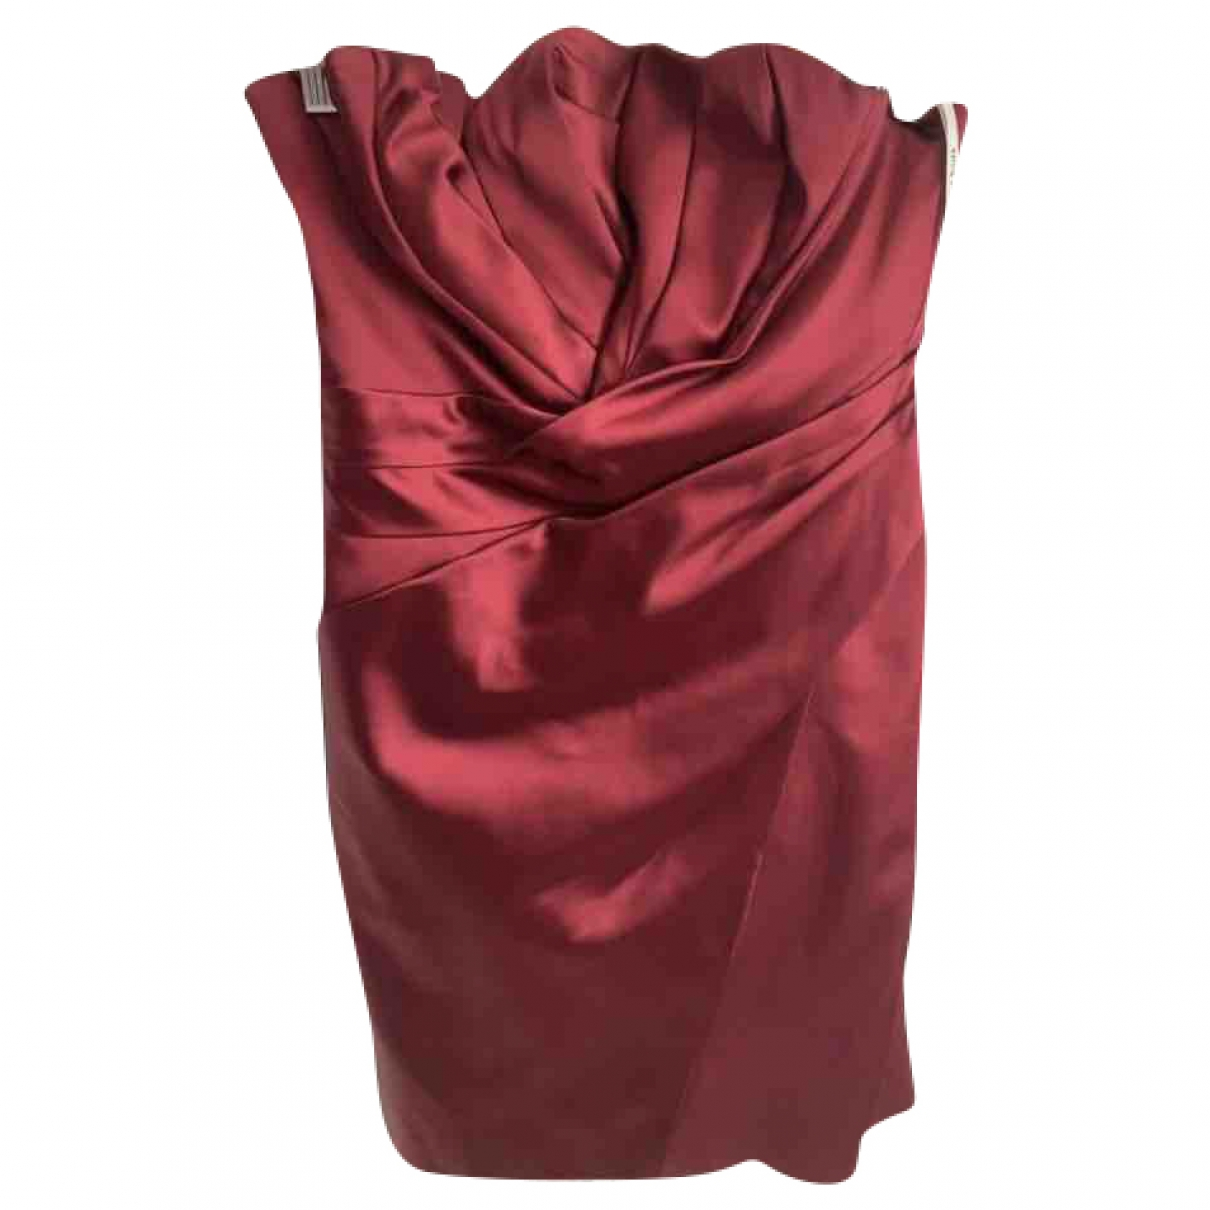 Karen Millen \N Burgundy Silk dress for Women 14 UK